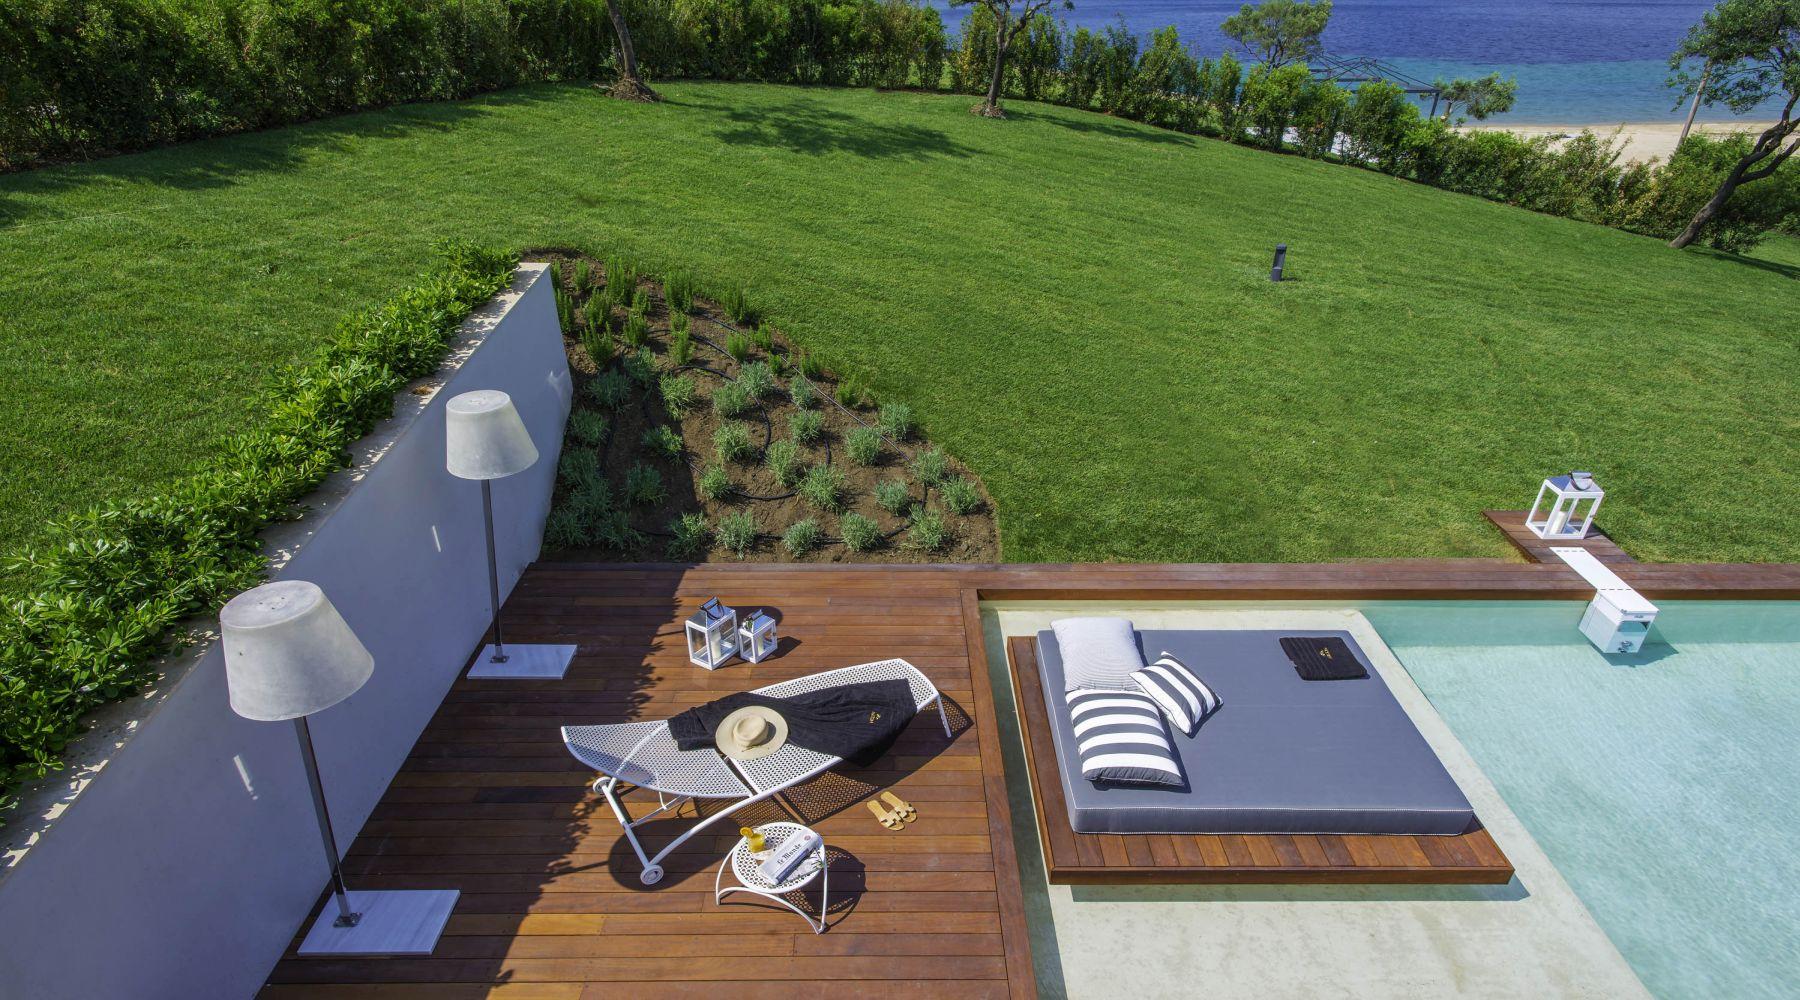 Avaton Luxury Hotel & Villas – Relais & Chateaux, Halkidiki